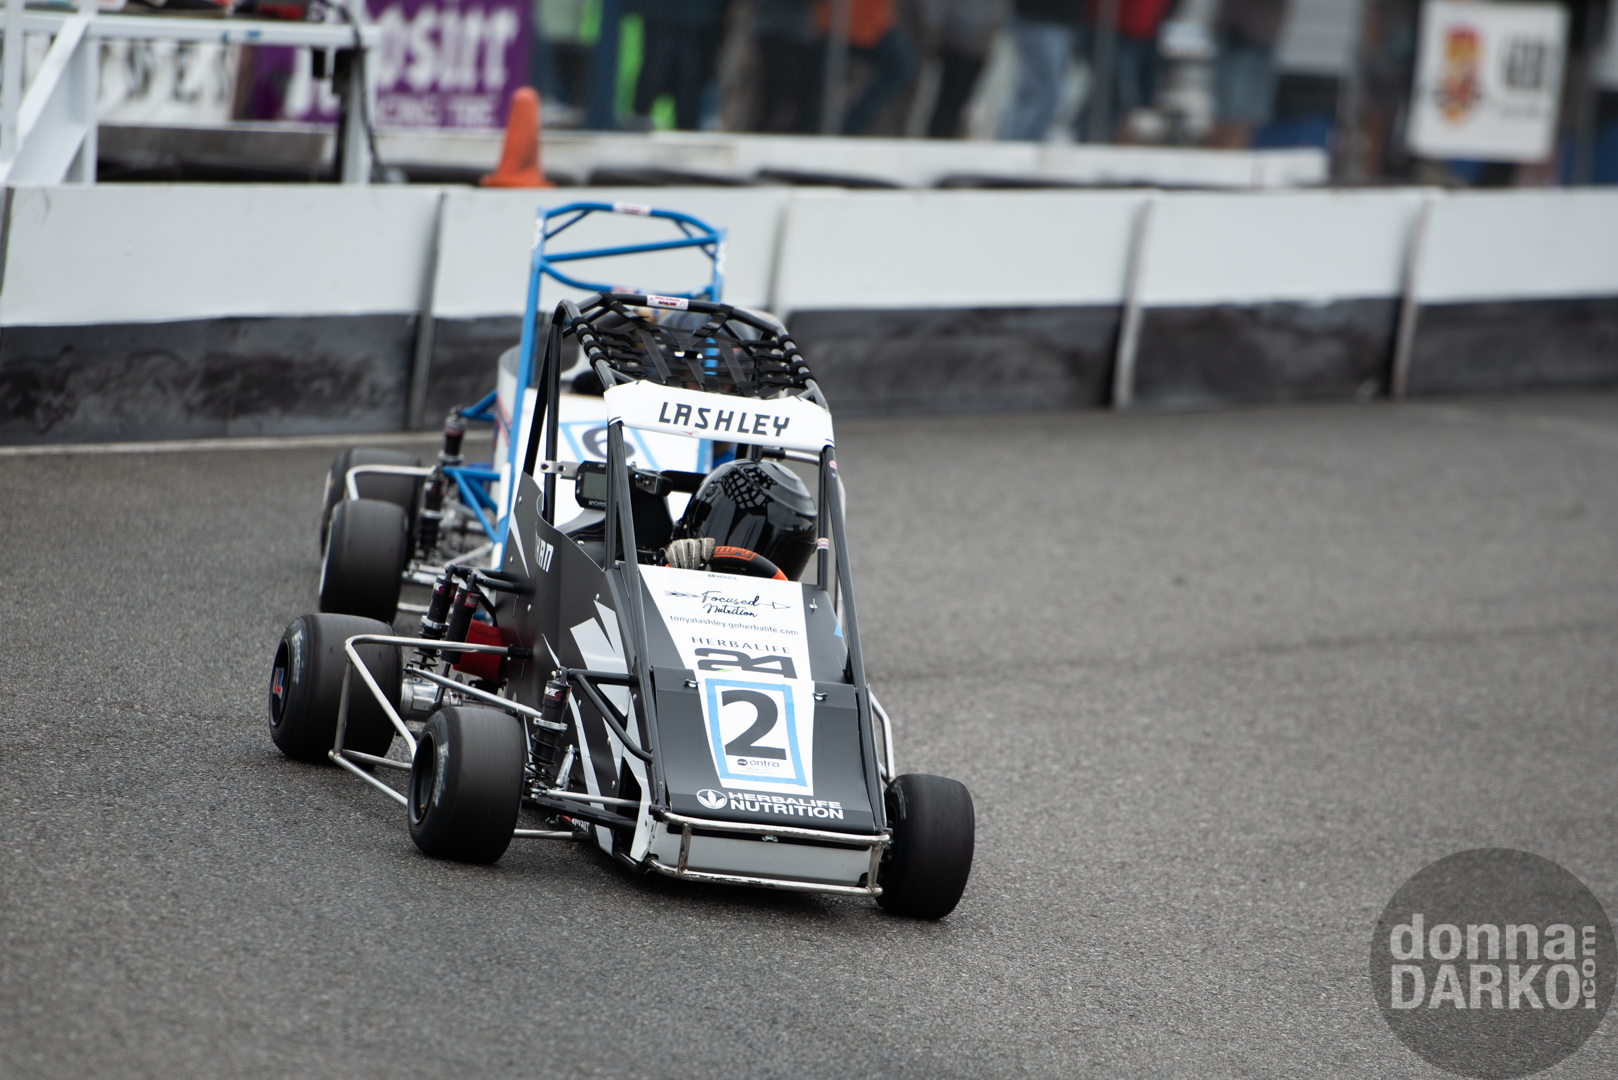 QWMA (Racing) 8-11-2019 DSC_5861.jpg